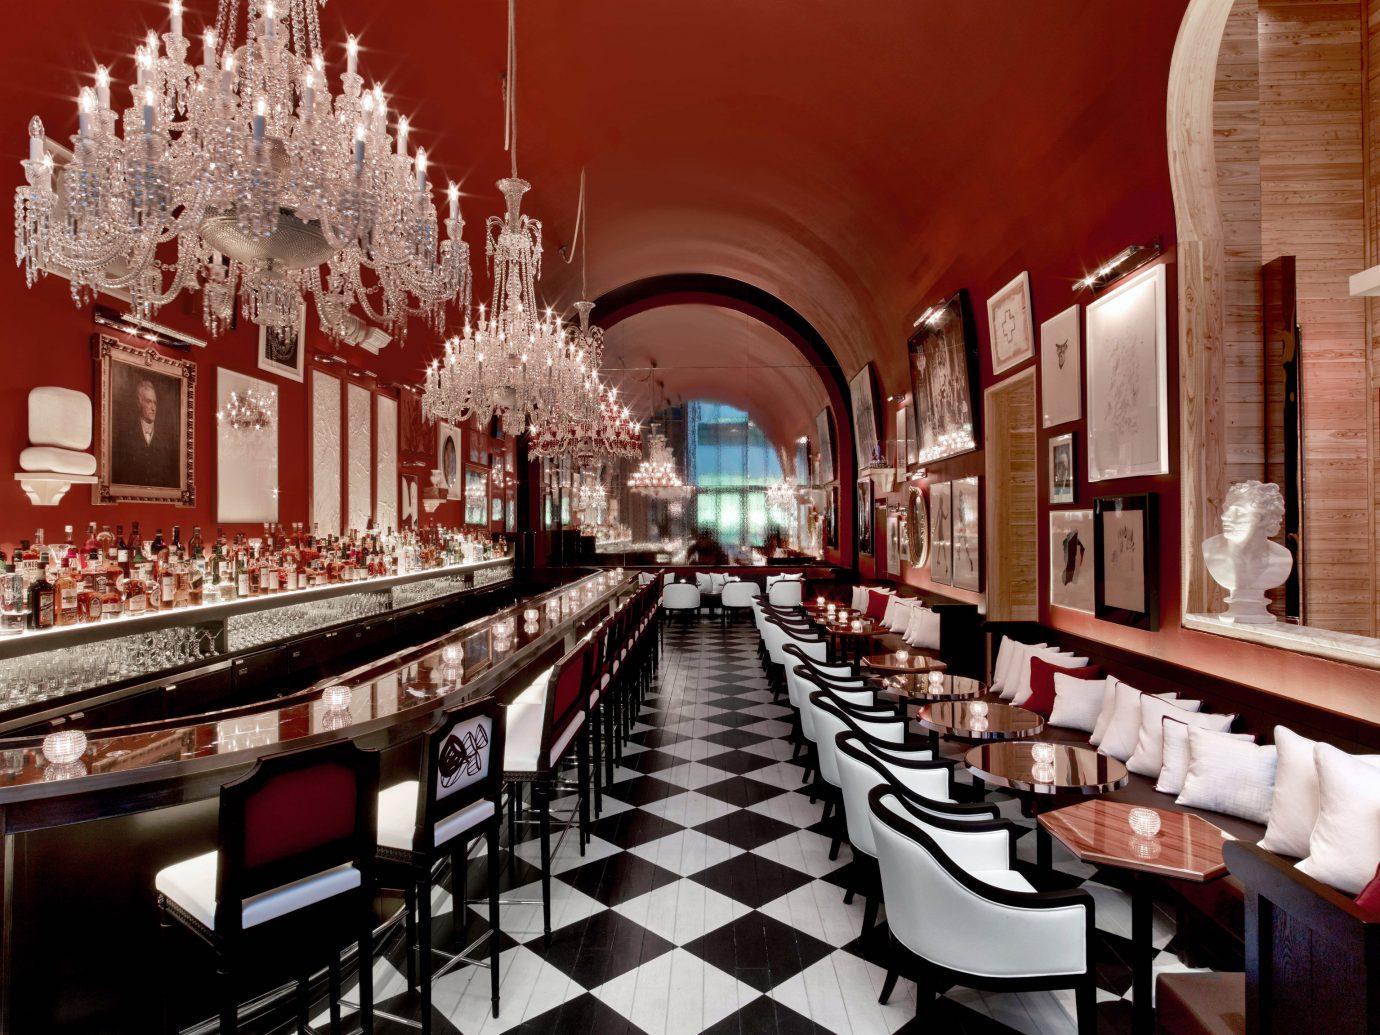 Hotels indoor restaurant meal function hall interior design Bar dining room